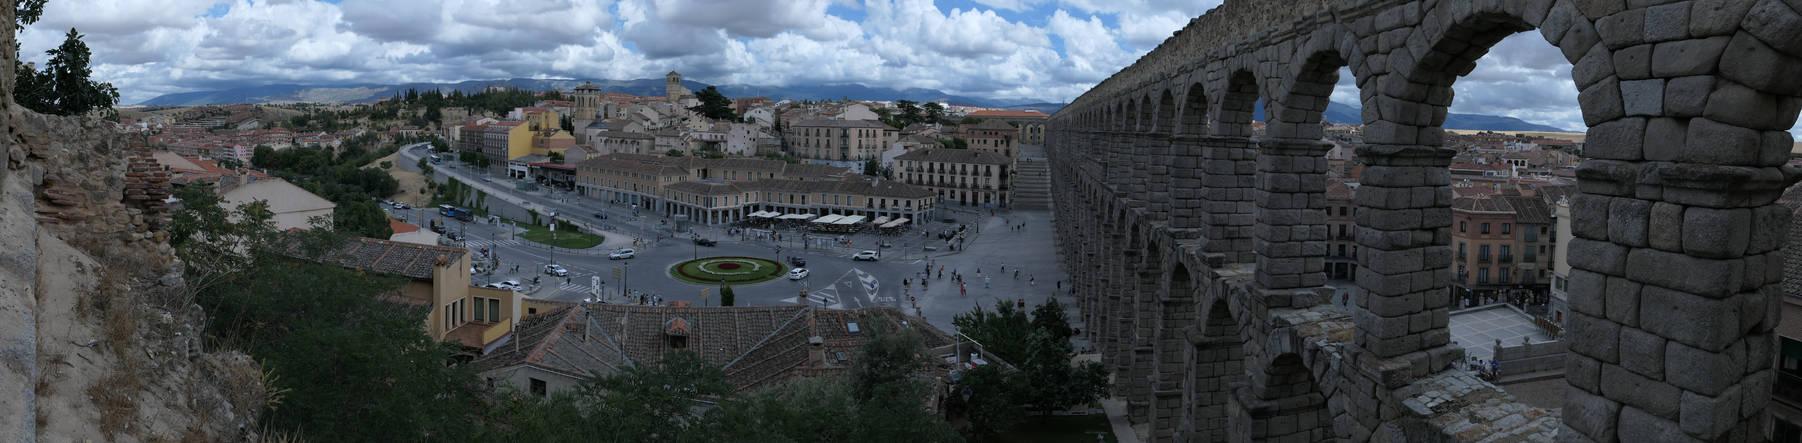 Acueducto de Segovia_7